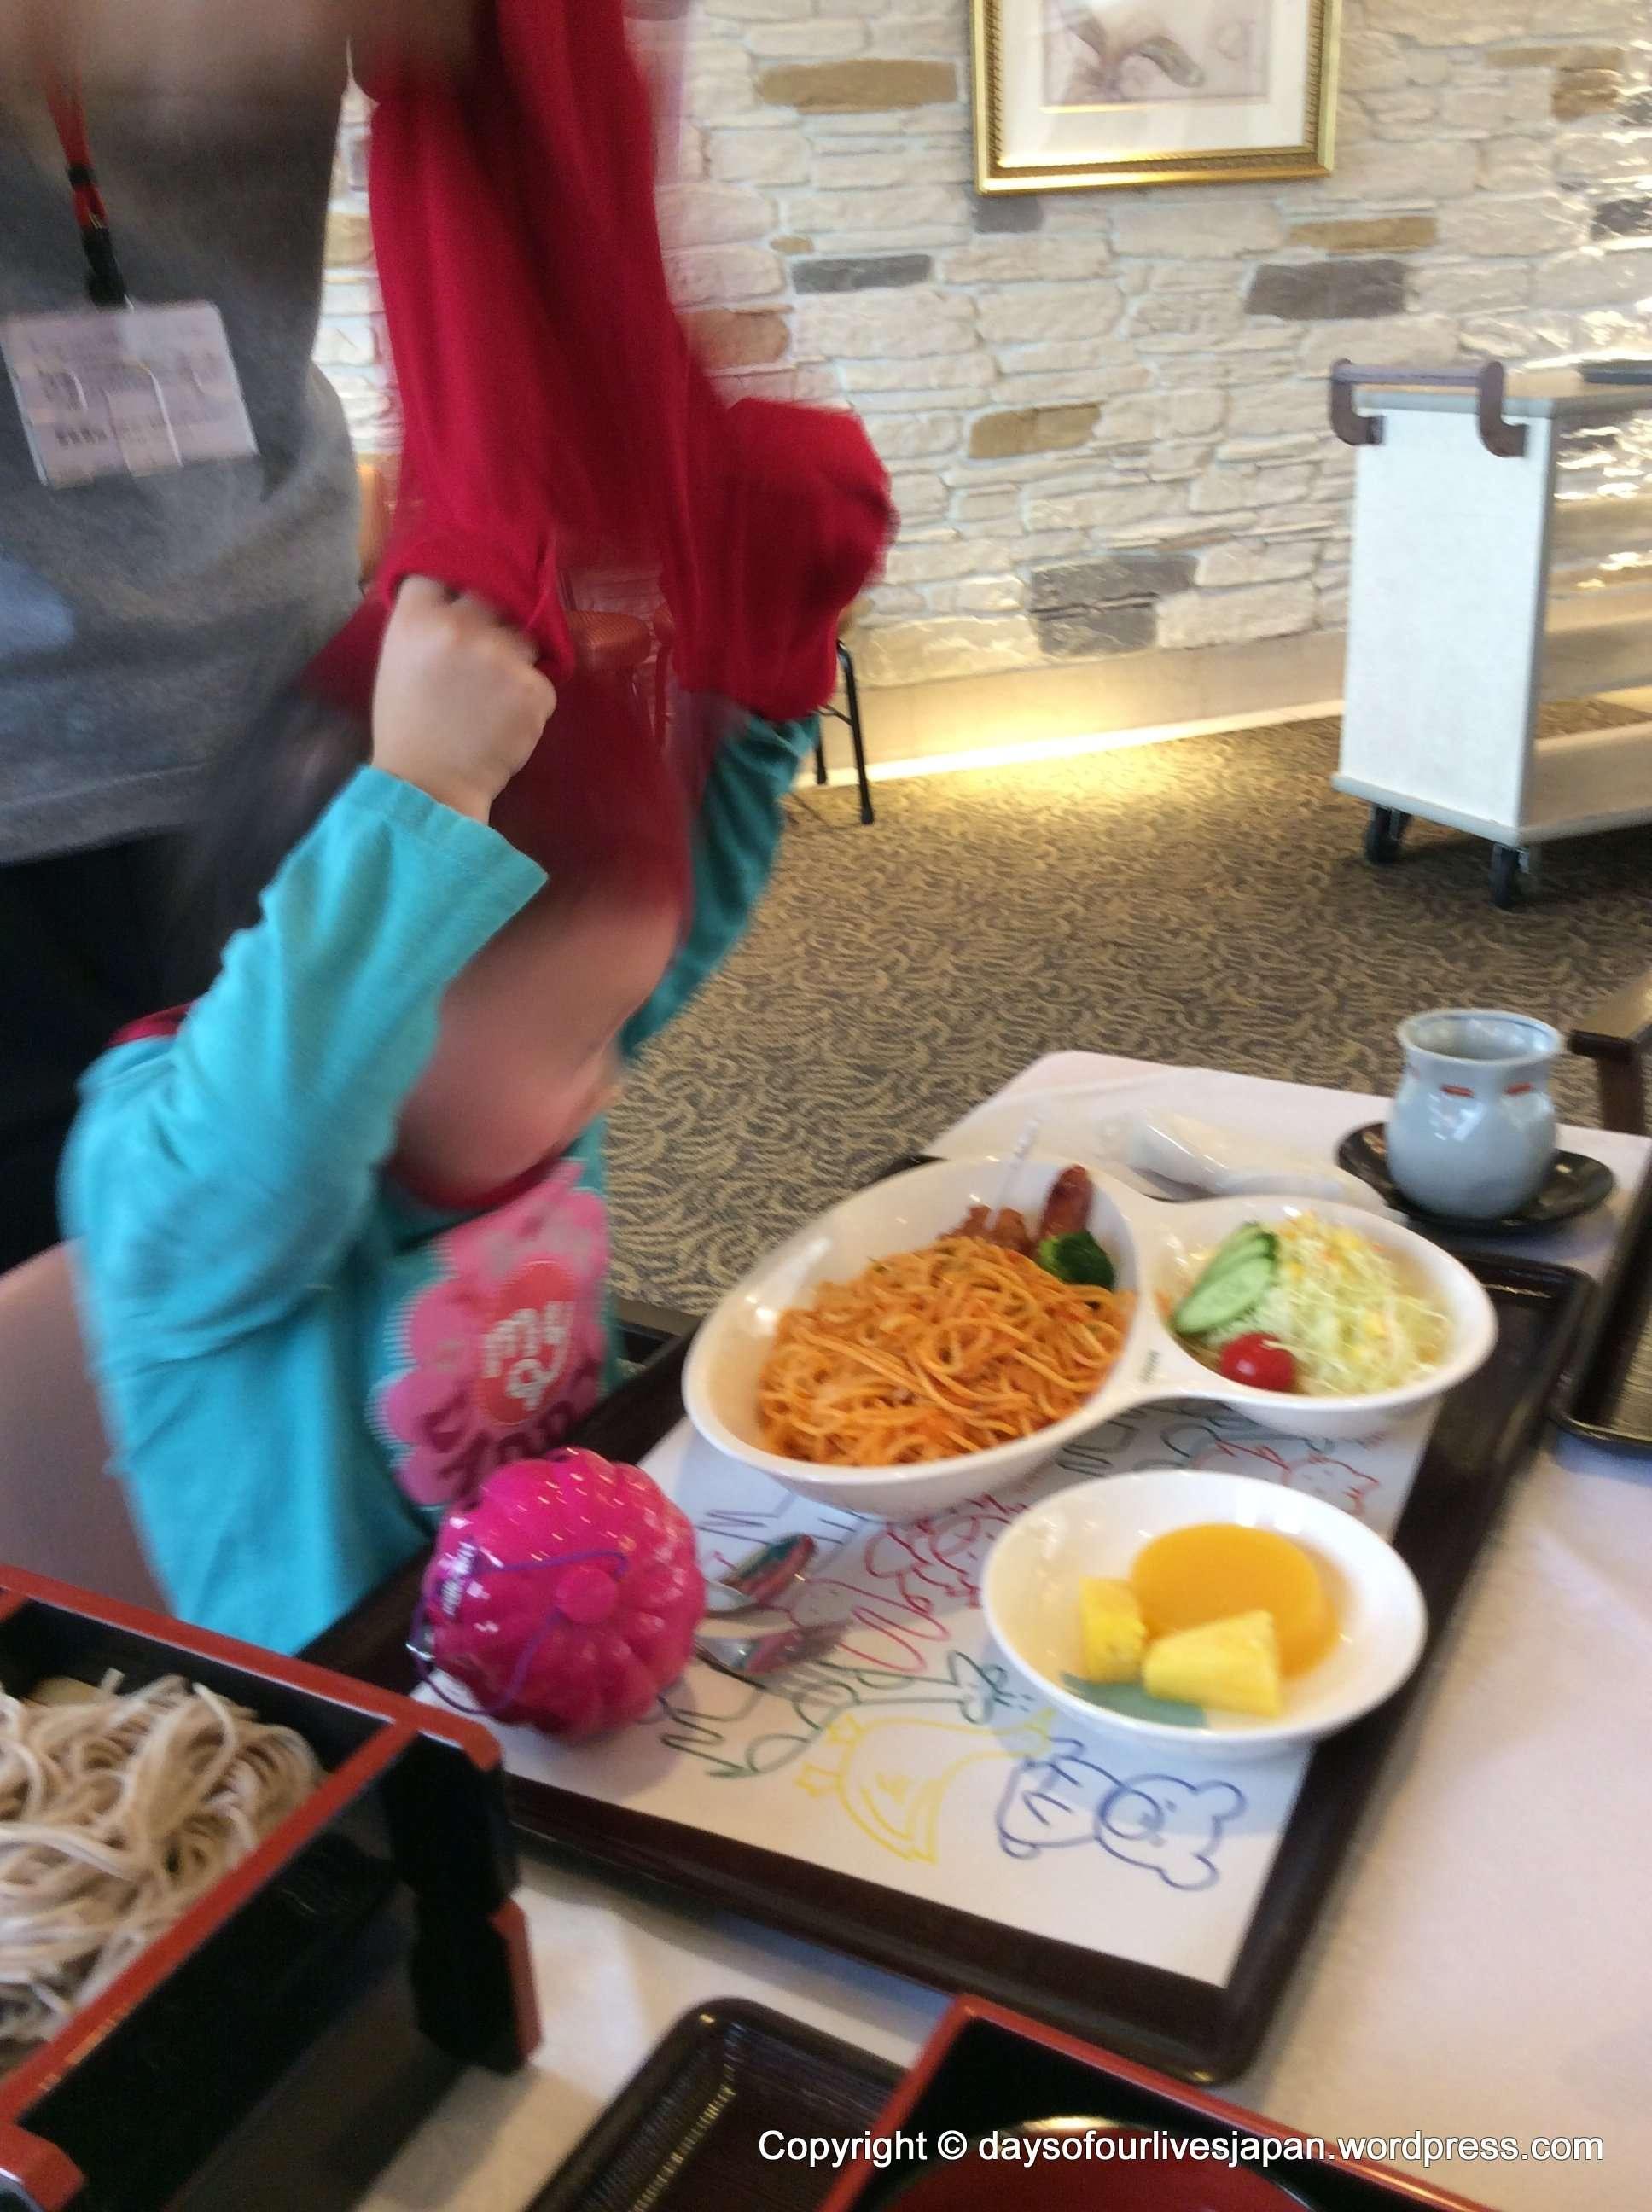 Kids plate